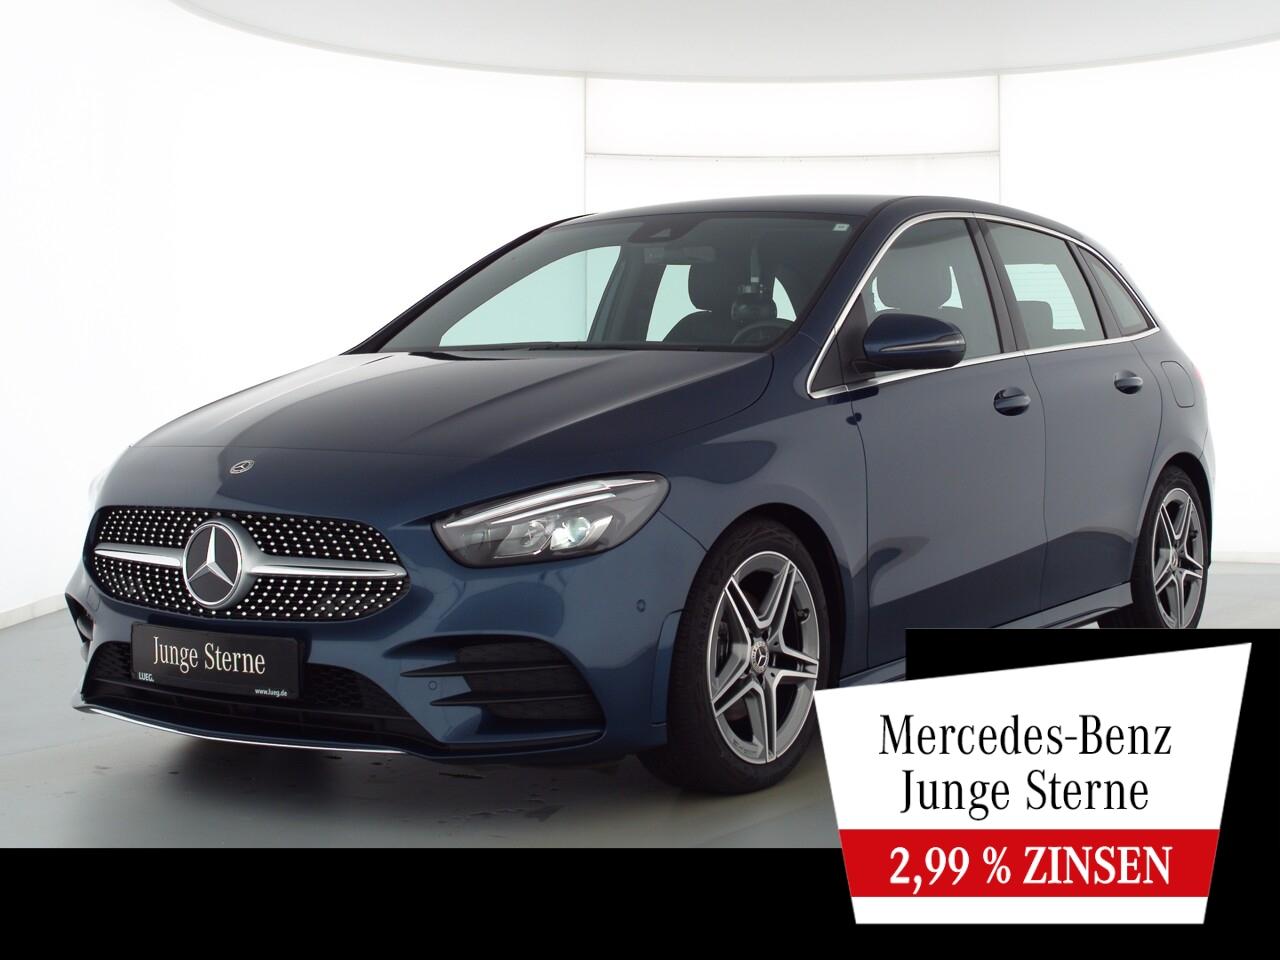 Mercedes-Benz B 200 d AMG+MBUX+NavPrem+LED-HP+EHeckk+ParkA+RFK, Jahr 2020, Diesel